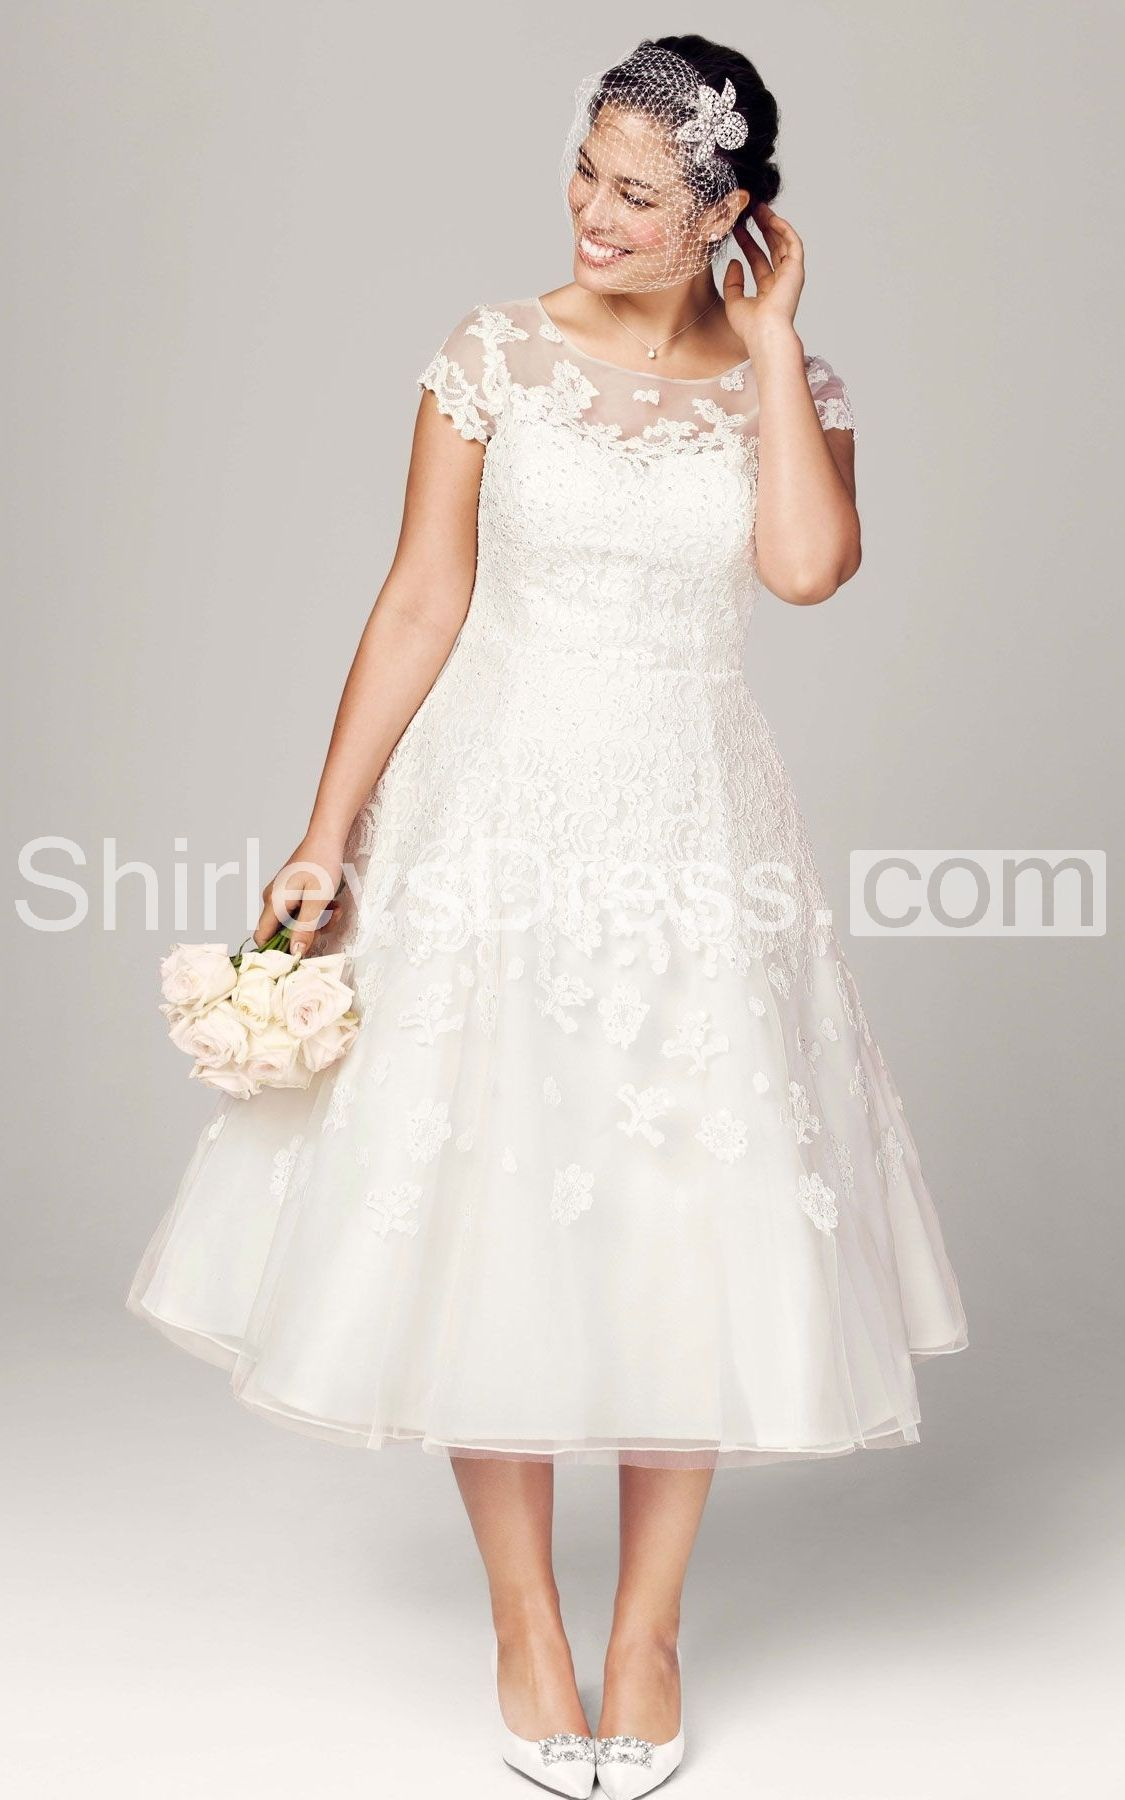 Tealength plus size wedding dress with cap sleeve illusion neckline